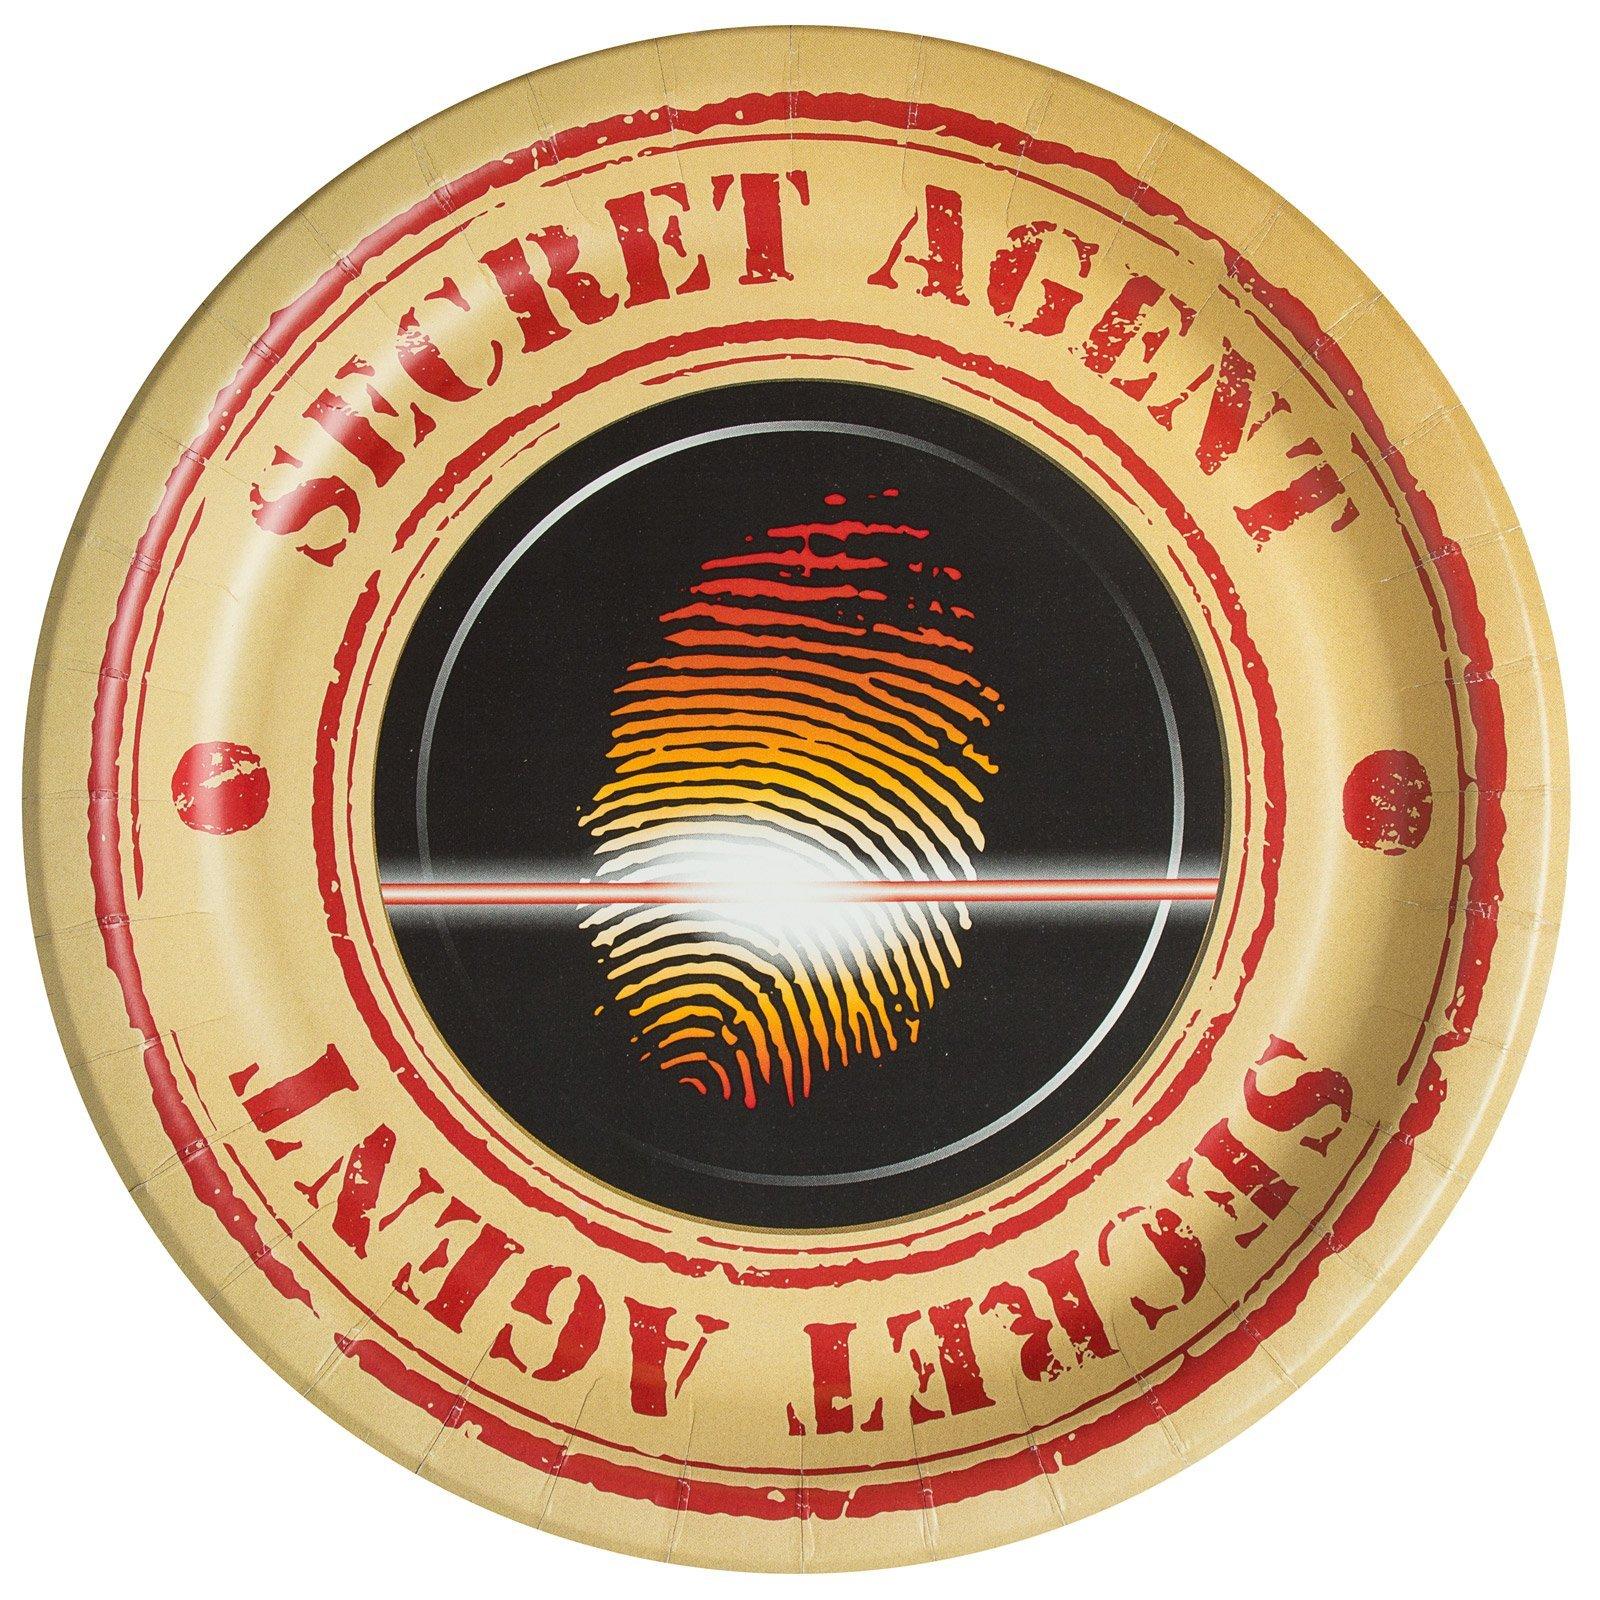 BirthdayExpress Top Secret Spy Party Dinner Plates (8)